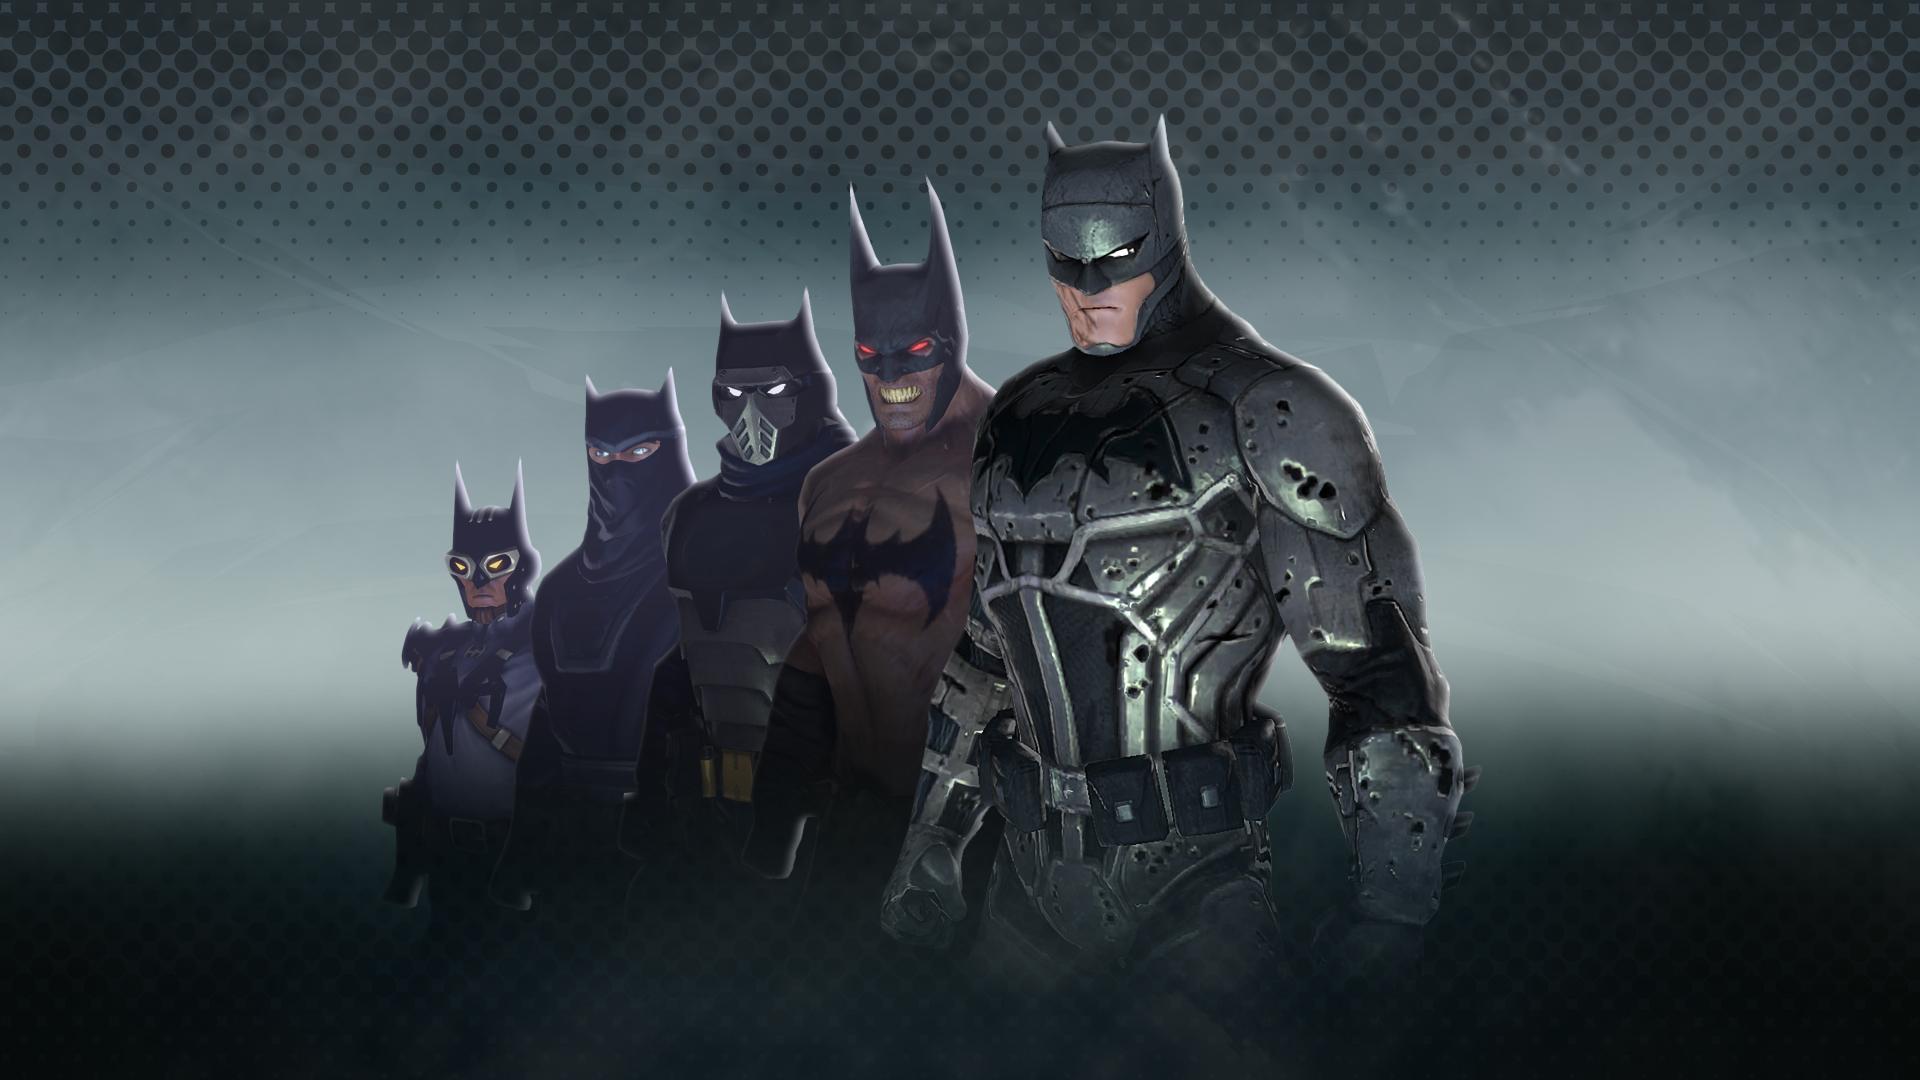 Steampowered Batman Dc Universe Online Wiki Fandom Powered By Wikia